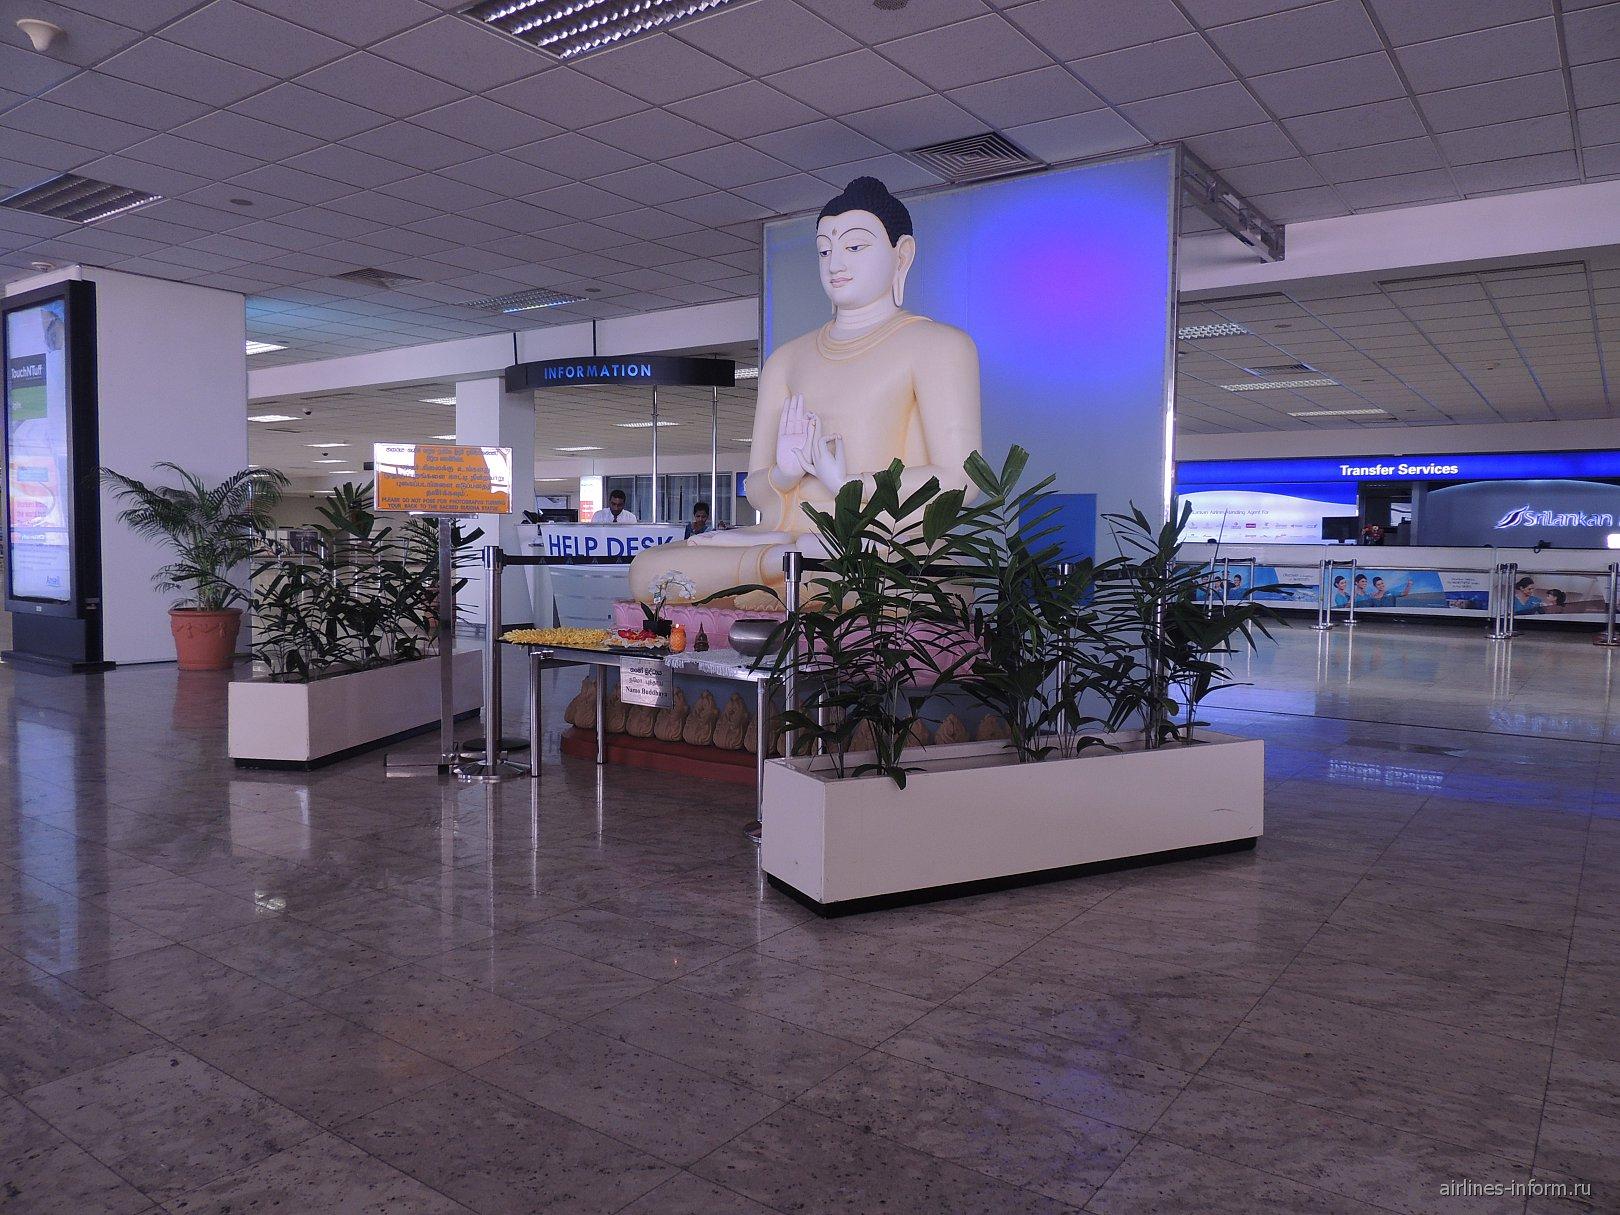 Будда в зале прилета аэропорта Коломбо Бандаранайке